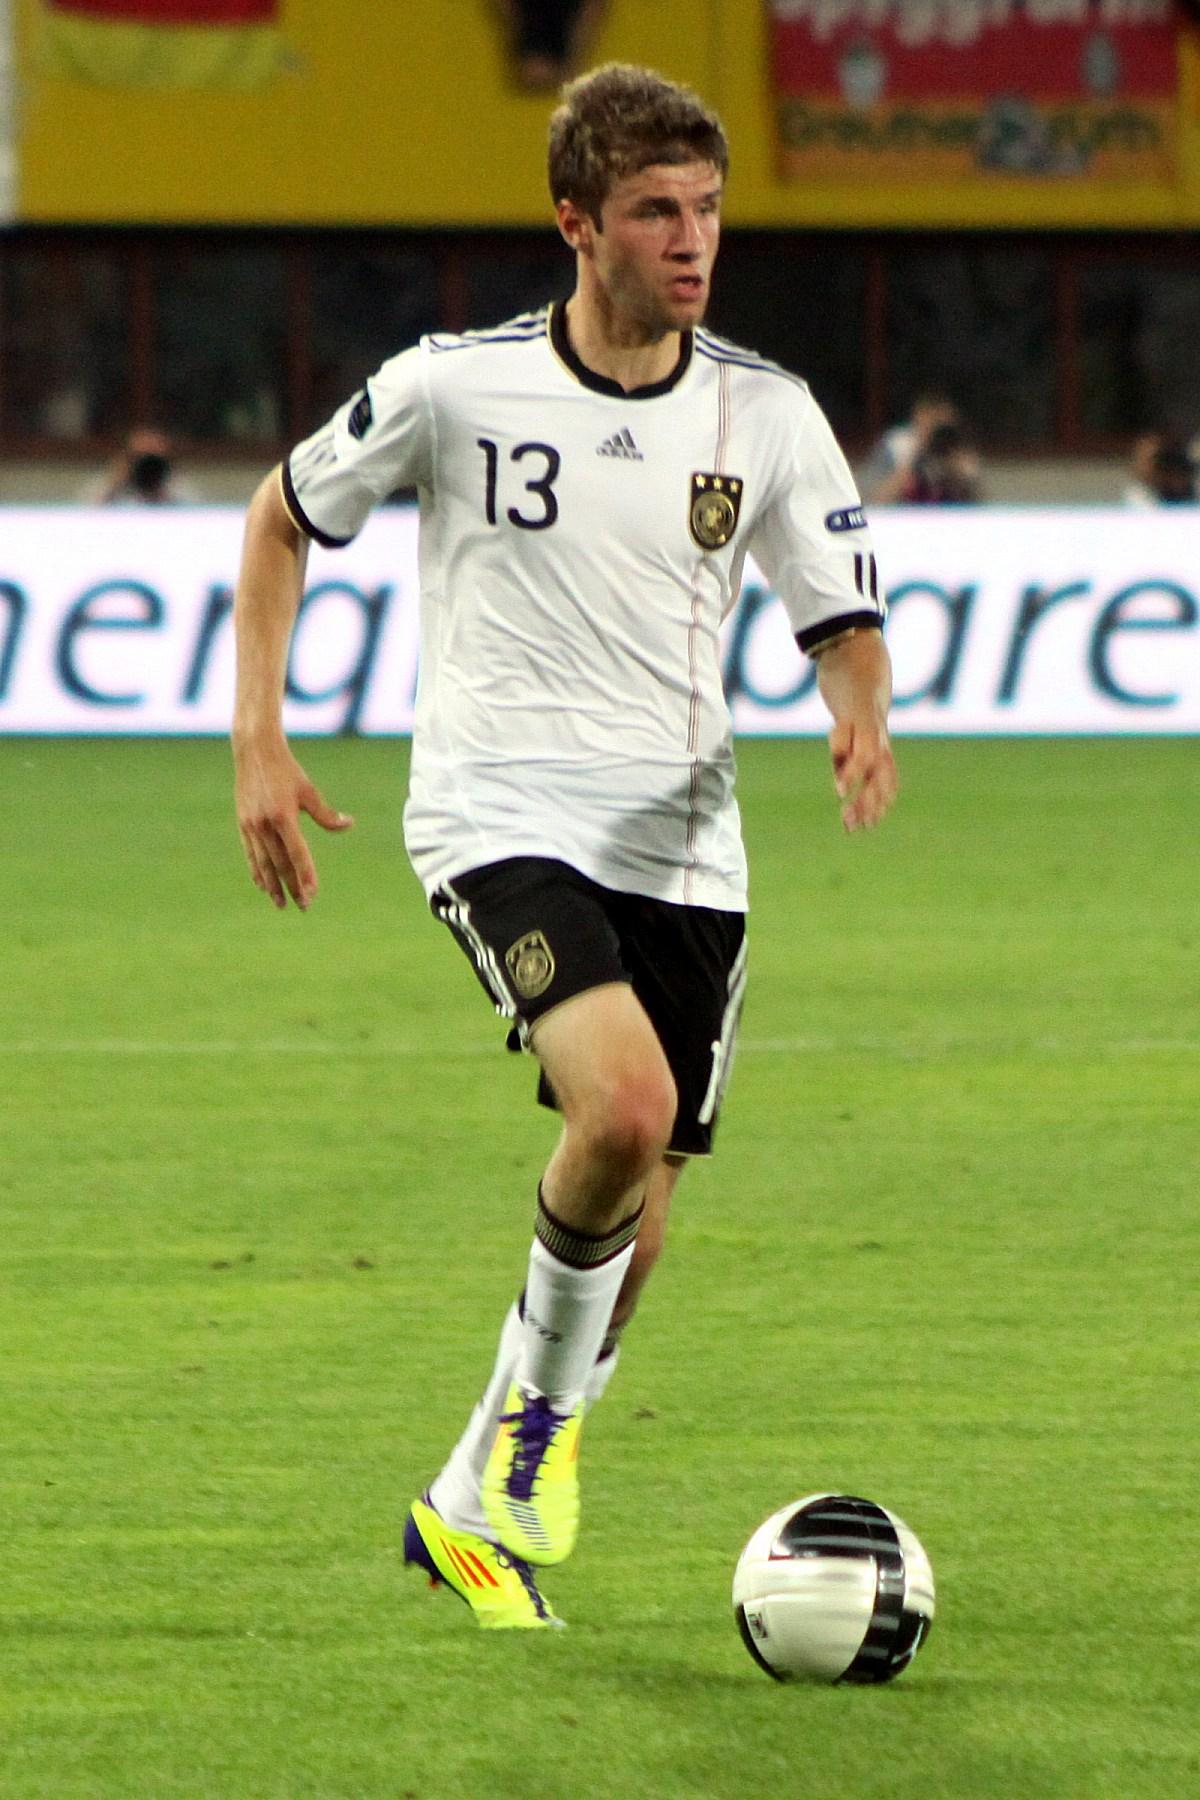 Datei:Thomas Müller, Germany national football team (05).jpg – Wikipedia